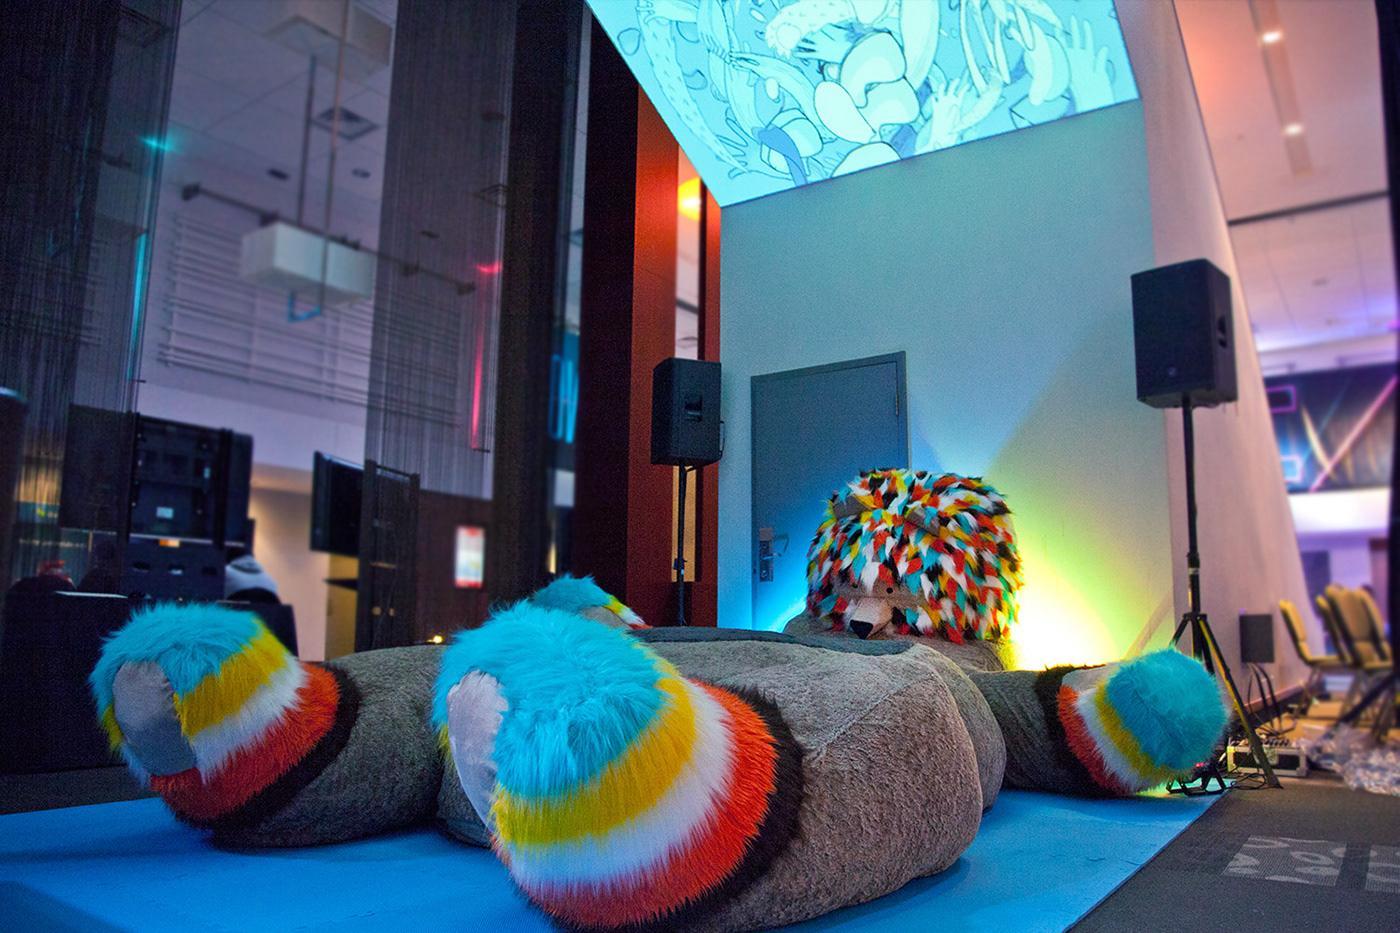 marvin the bear giant bear FITC Toronto Art Installation 12' bear